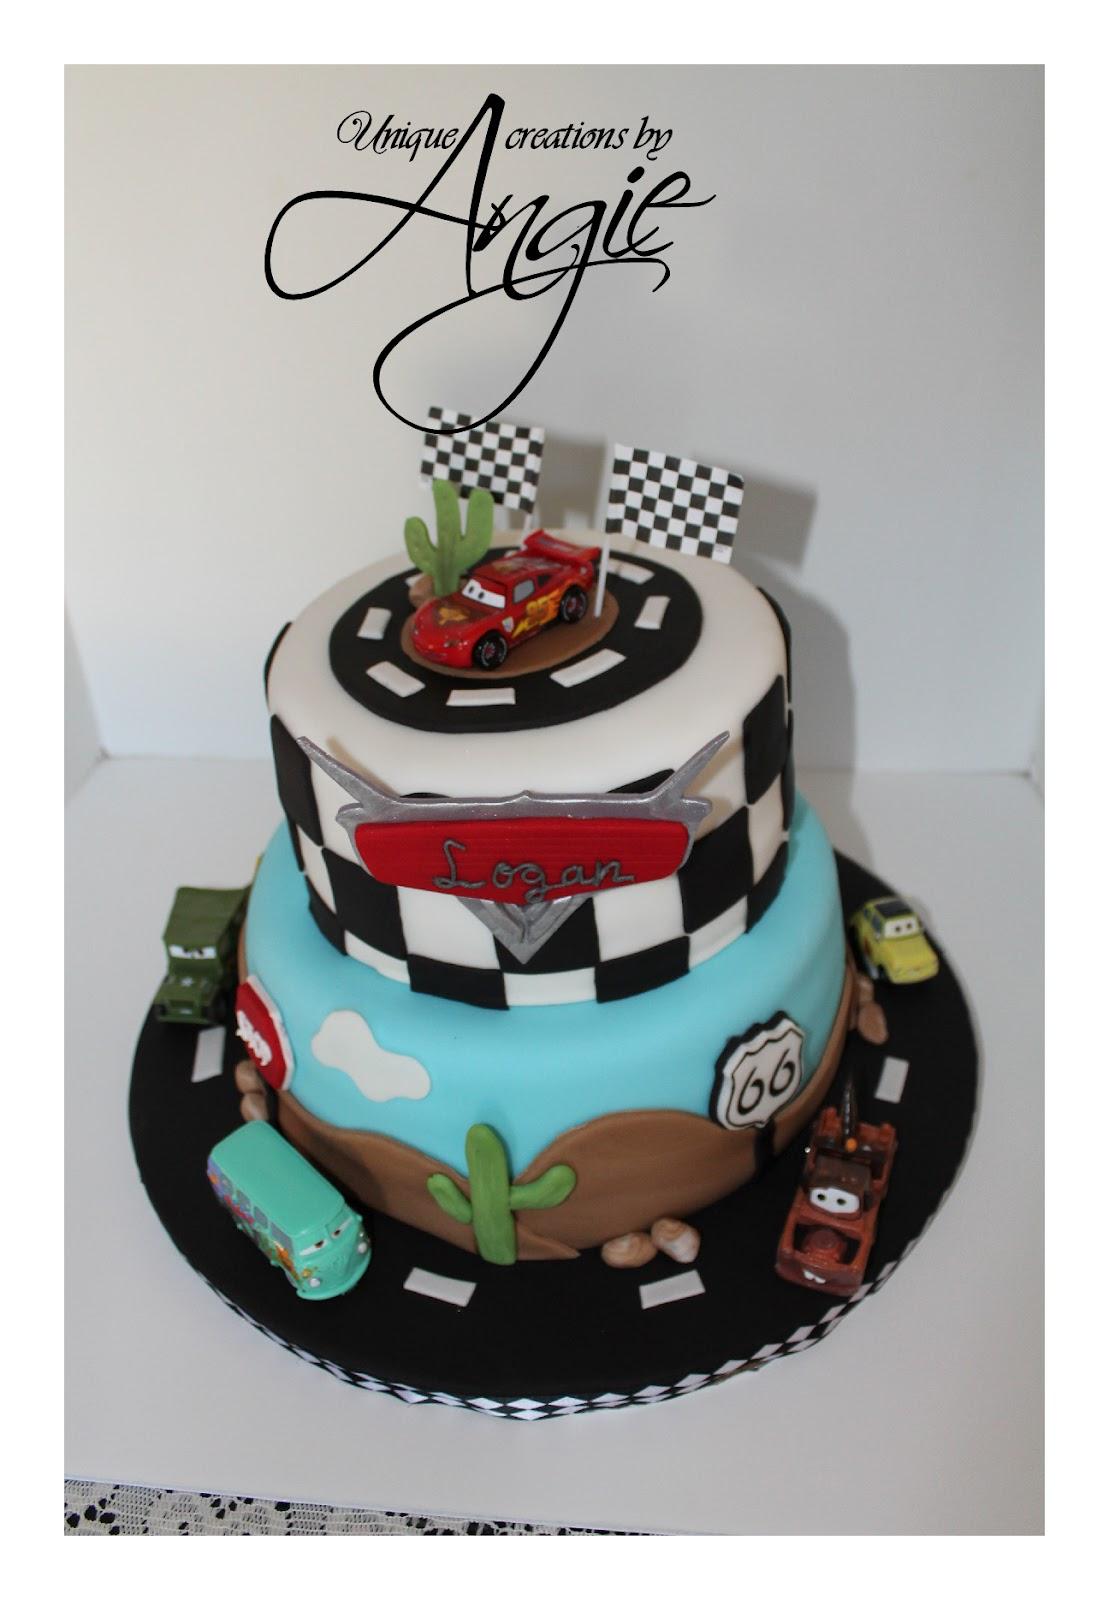 cars1 frozen birthday cakes at walmart 1 on frozen birthday cakes at walmart